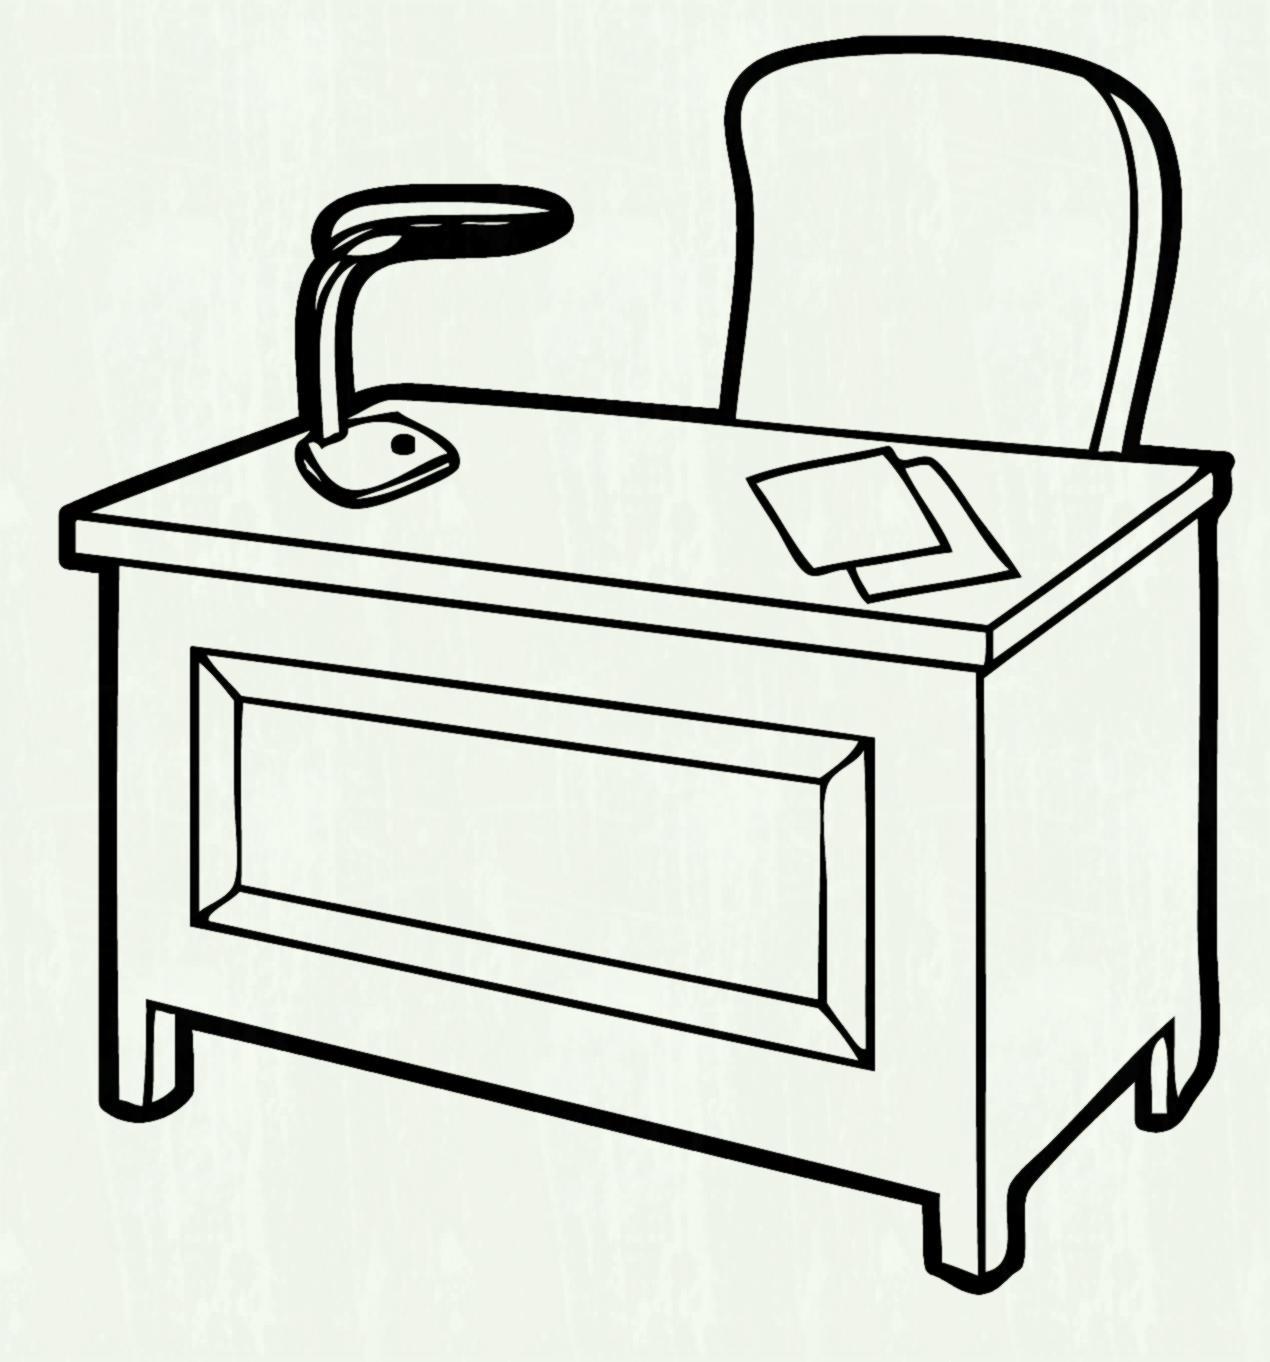 Desk clipart black and white 5 » Clipart Station.